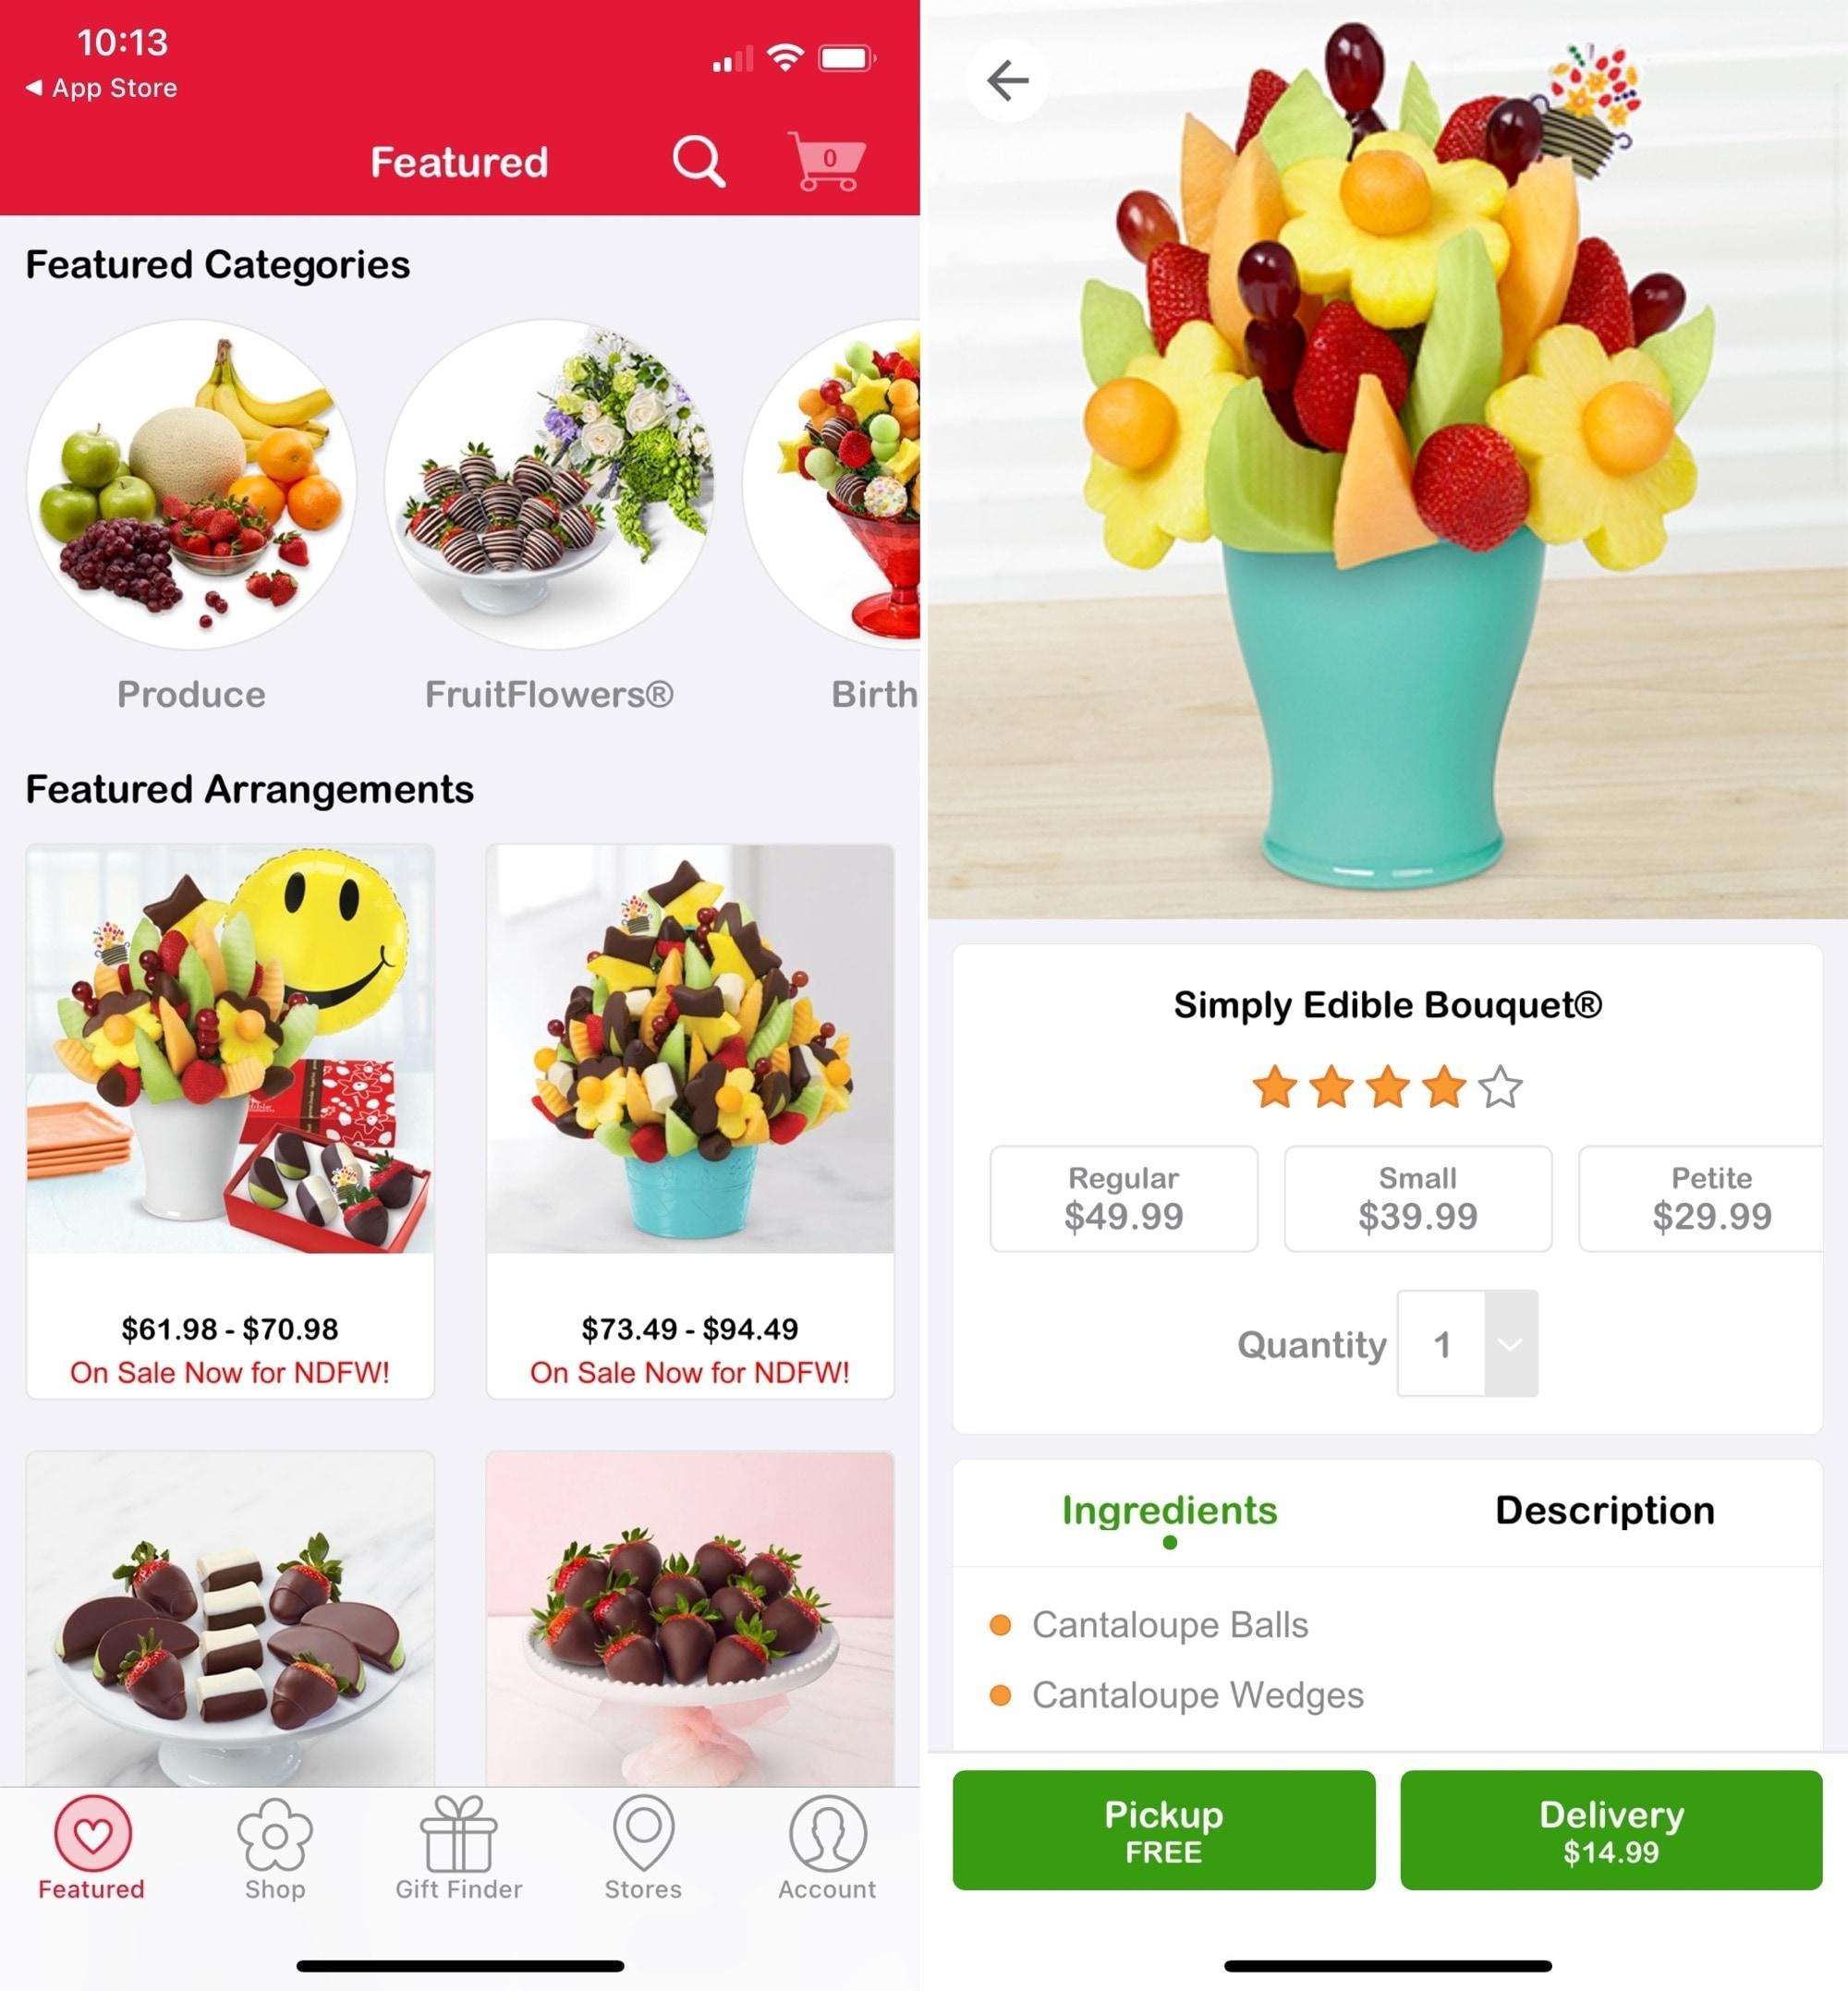 Edible Arrangements on iPhone